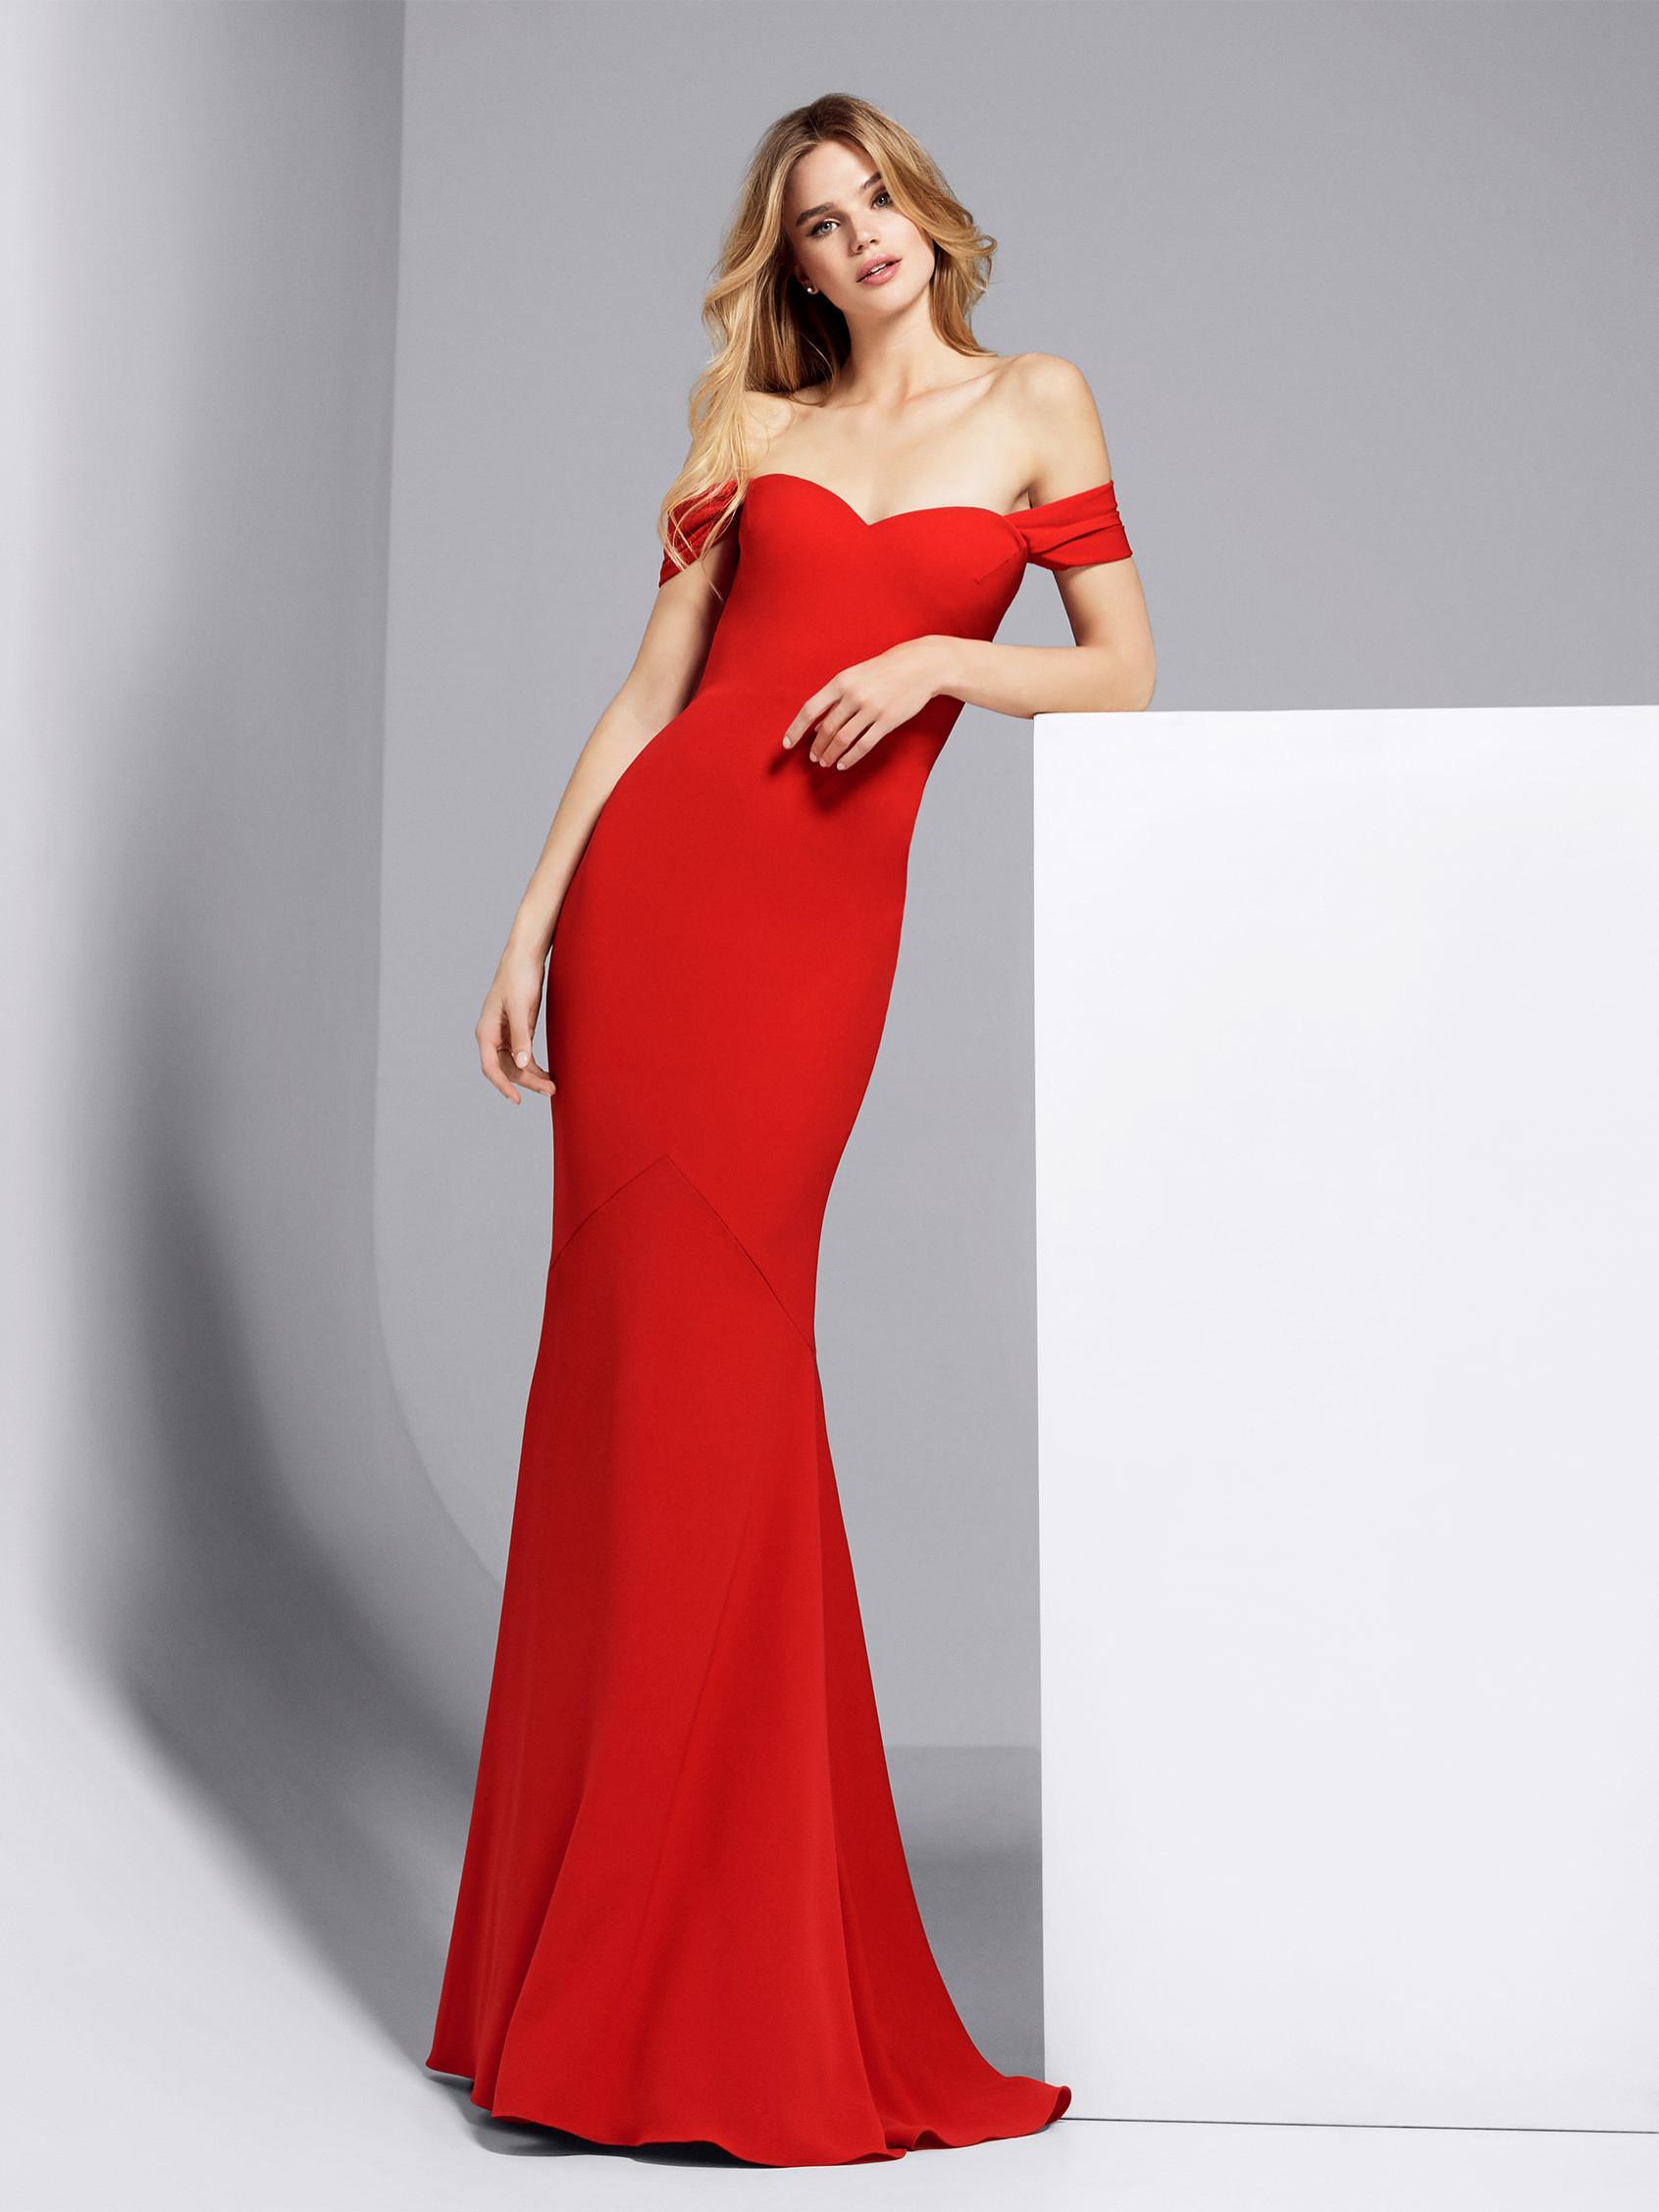 Mira Couture Atelier Pronovias Georgeta Evening Gown Cocktail Dress Chicago Boutique Front